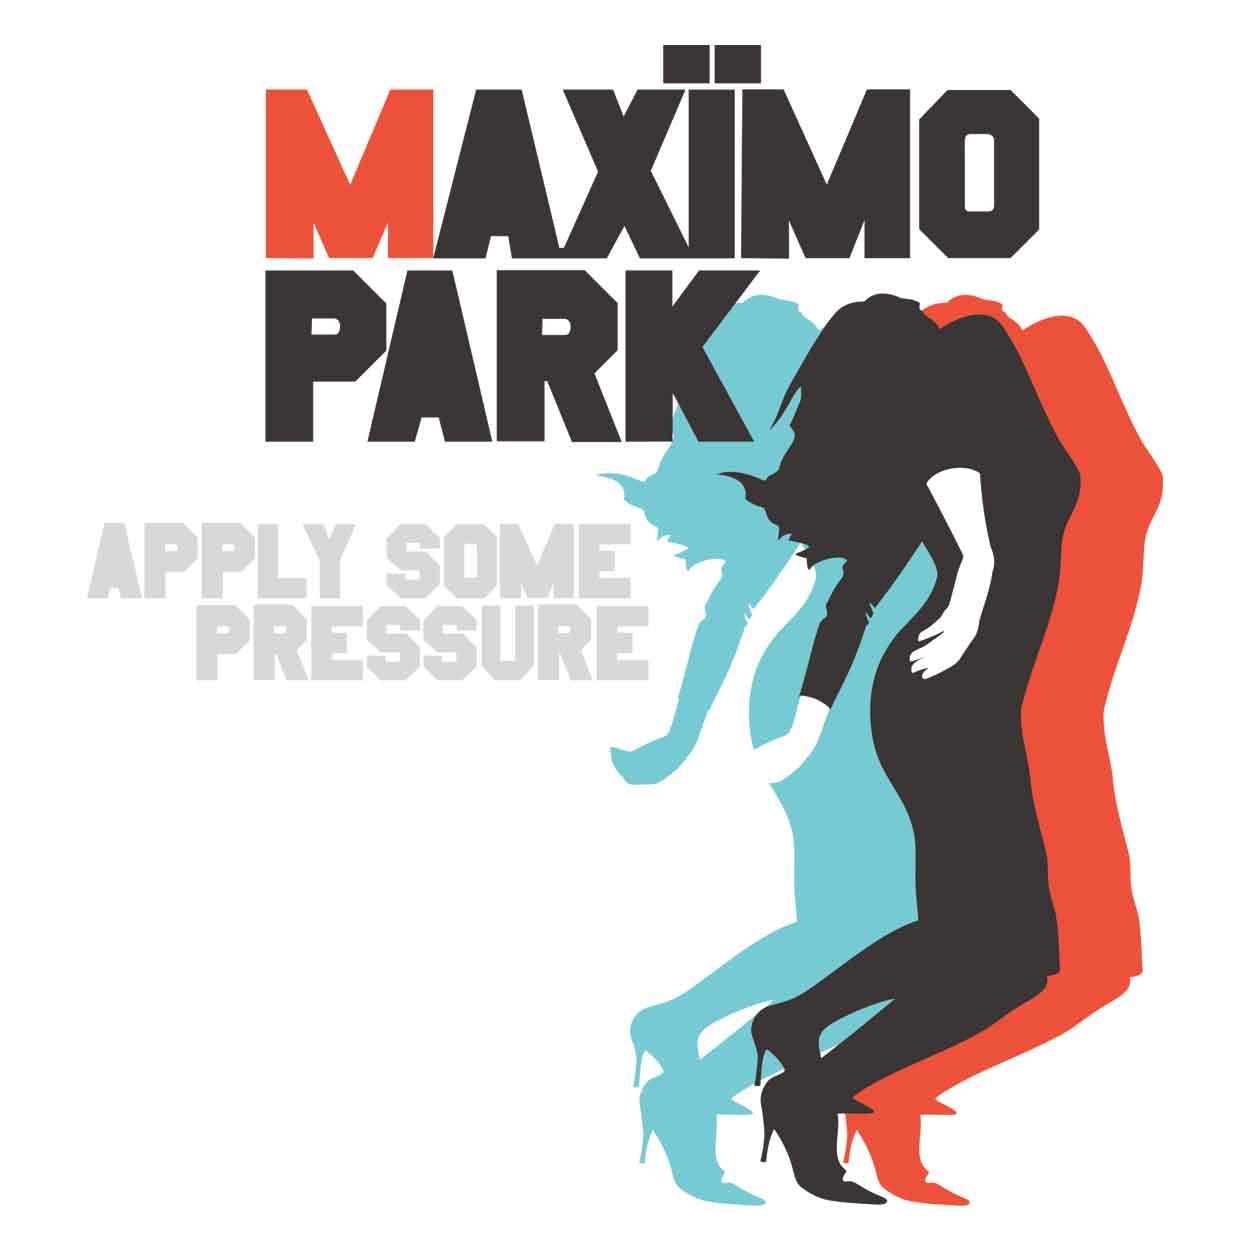 Camiseta Apply Some Pressure - Maximo Park - Masculino